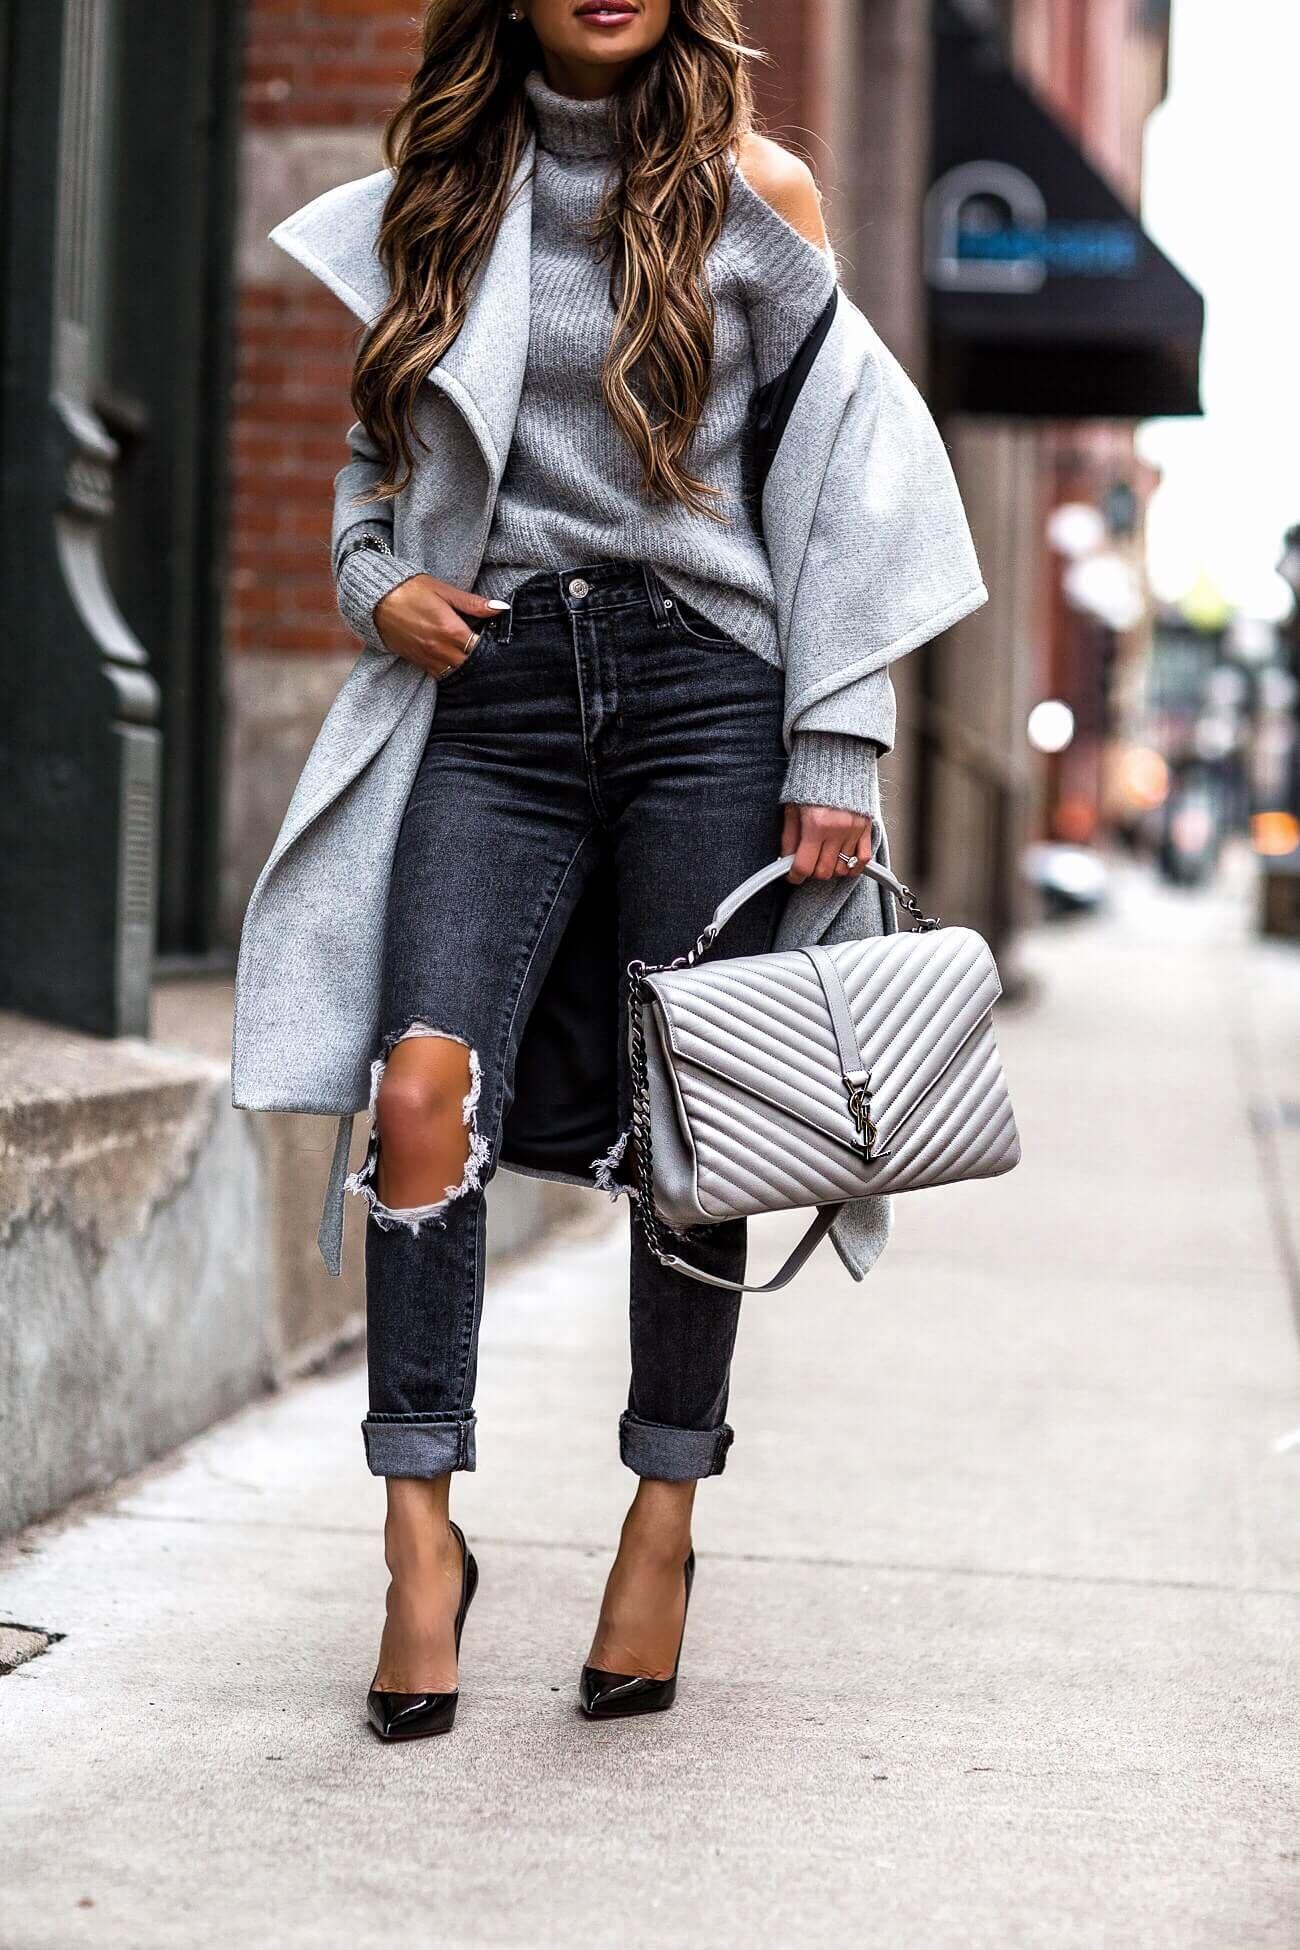 fashion blogger mia mia mine wearing a ysl college bag and louboutin heels 0b25be4e7